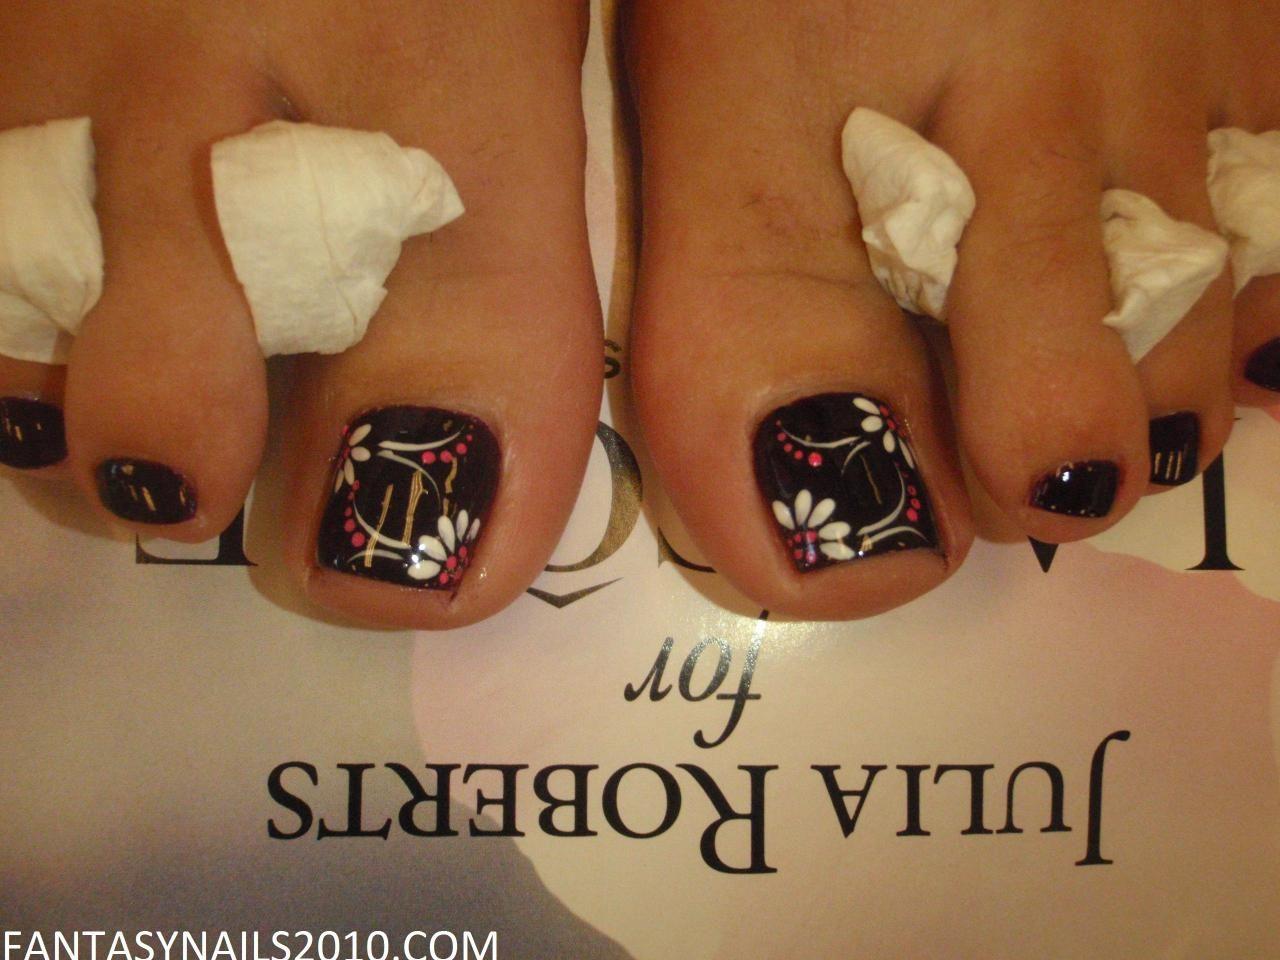 FANTASY NAILS - PEDICURE DESIGN   Nails   Pinterest   Pedicures ...